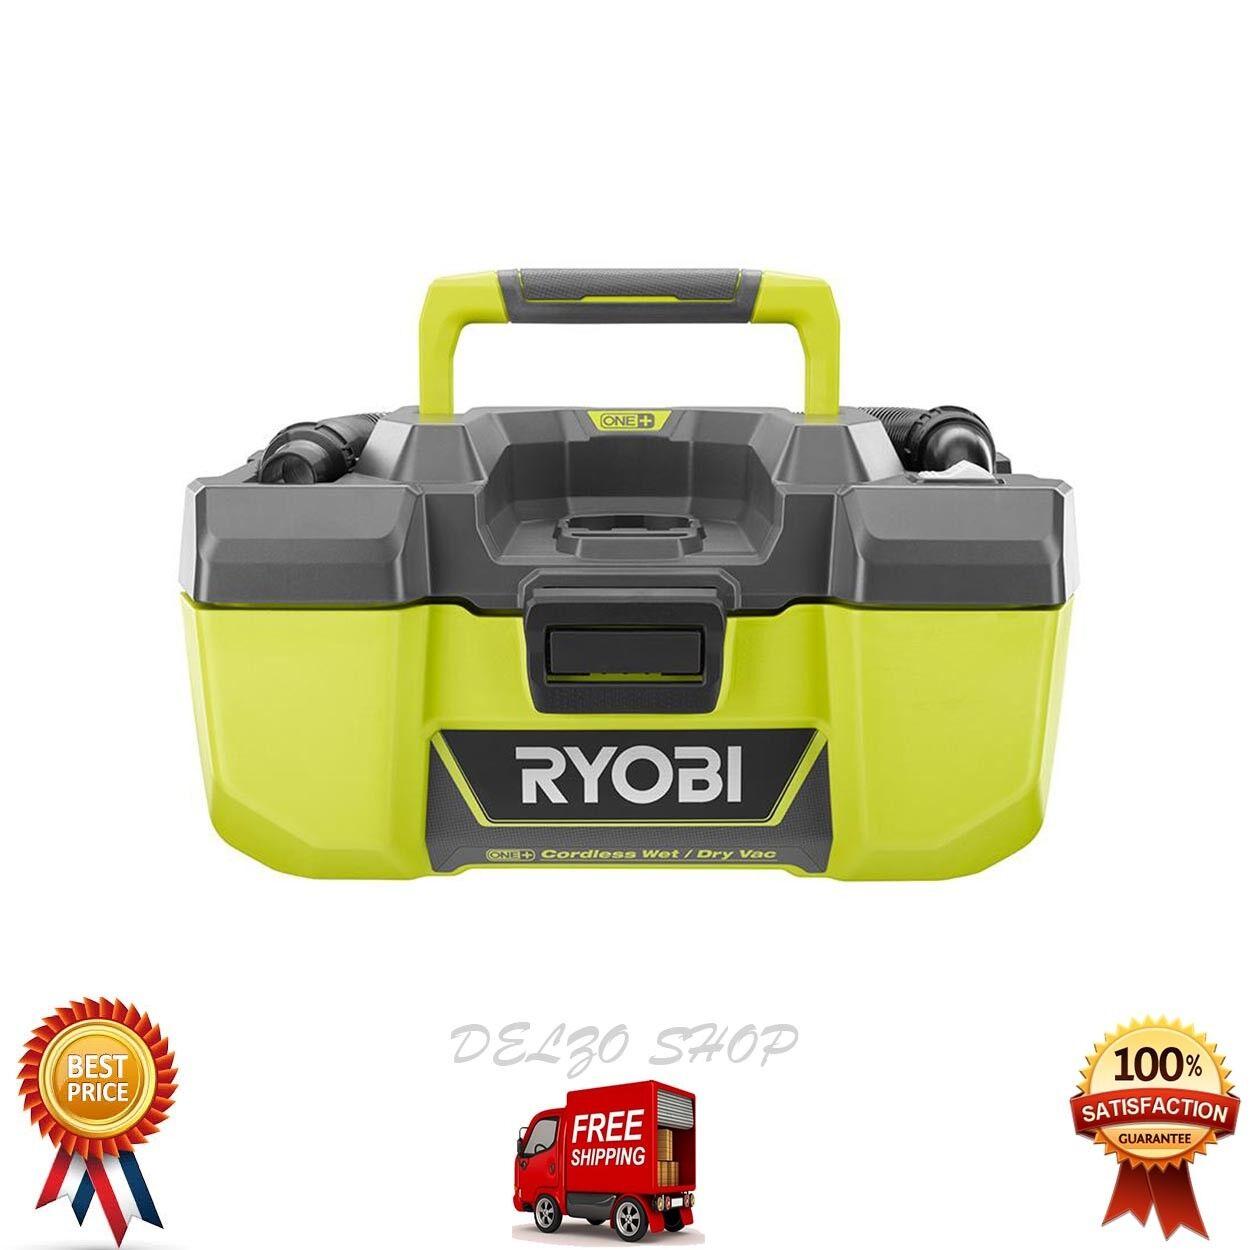 NEW Ryobi Wet Dry Vacuum Blower ONE+ 18V 3 Gal. Built-In Accessory Storage P3240